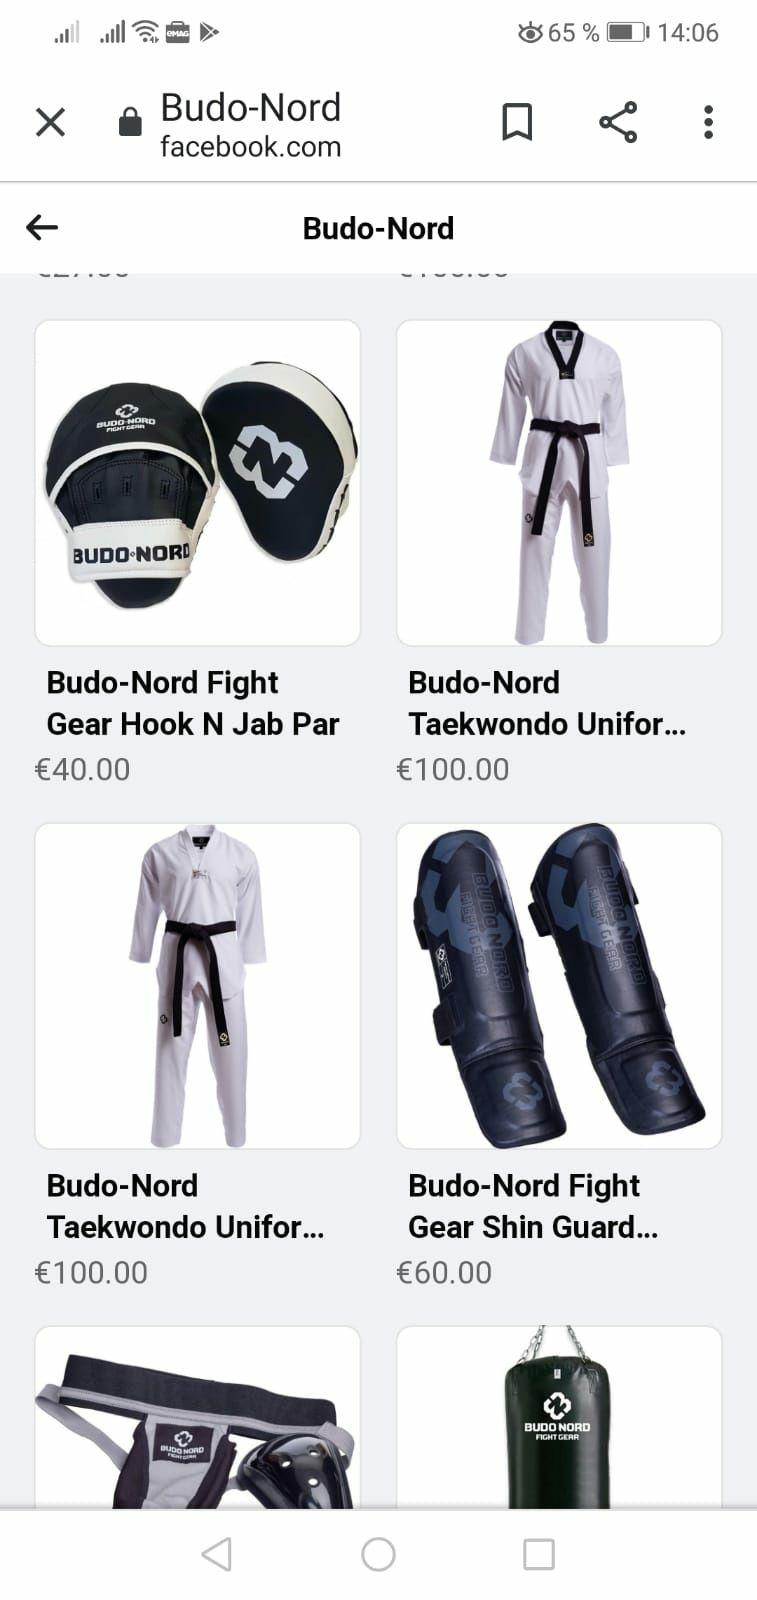 unică dating taekwondo